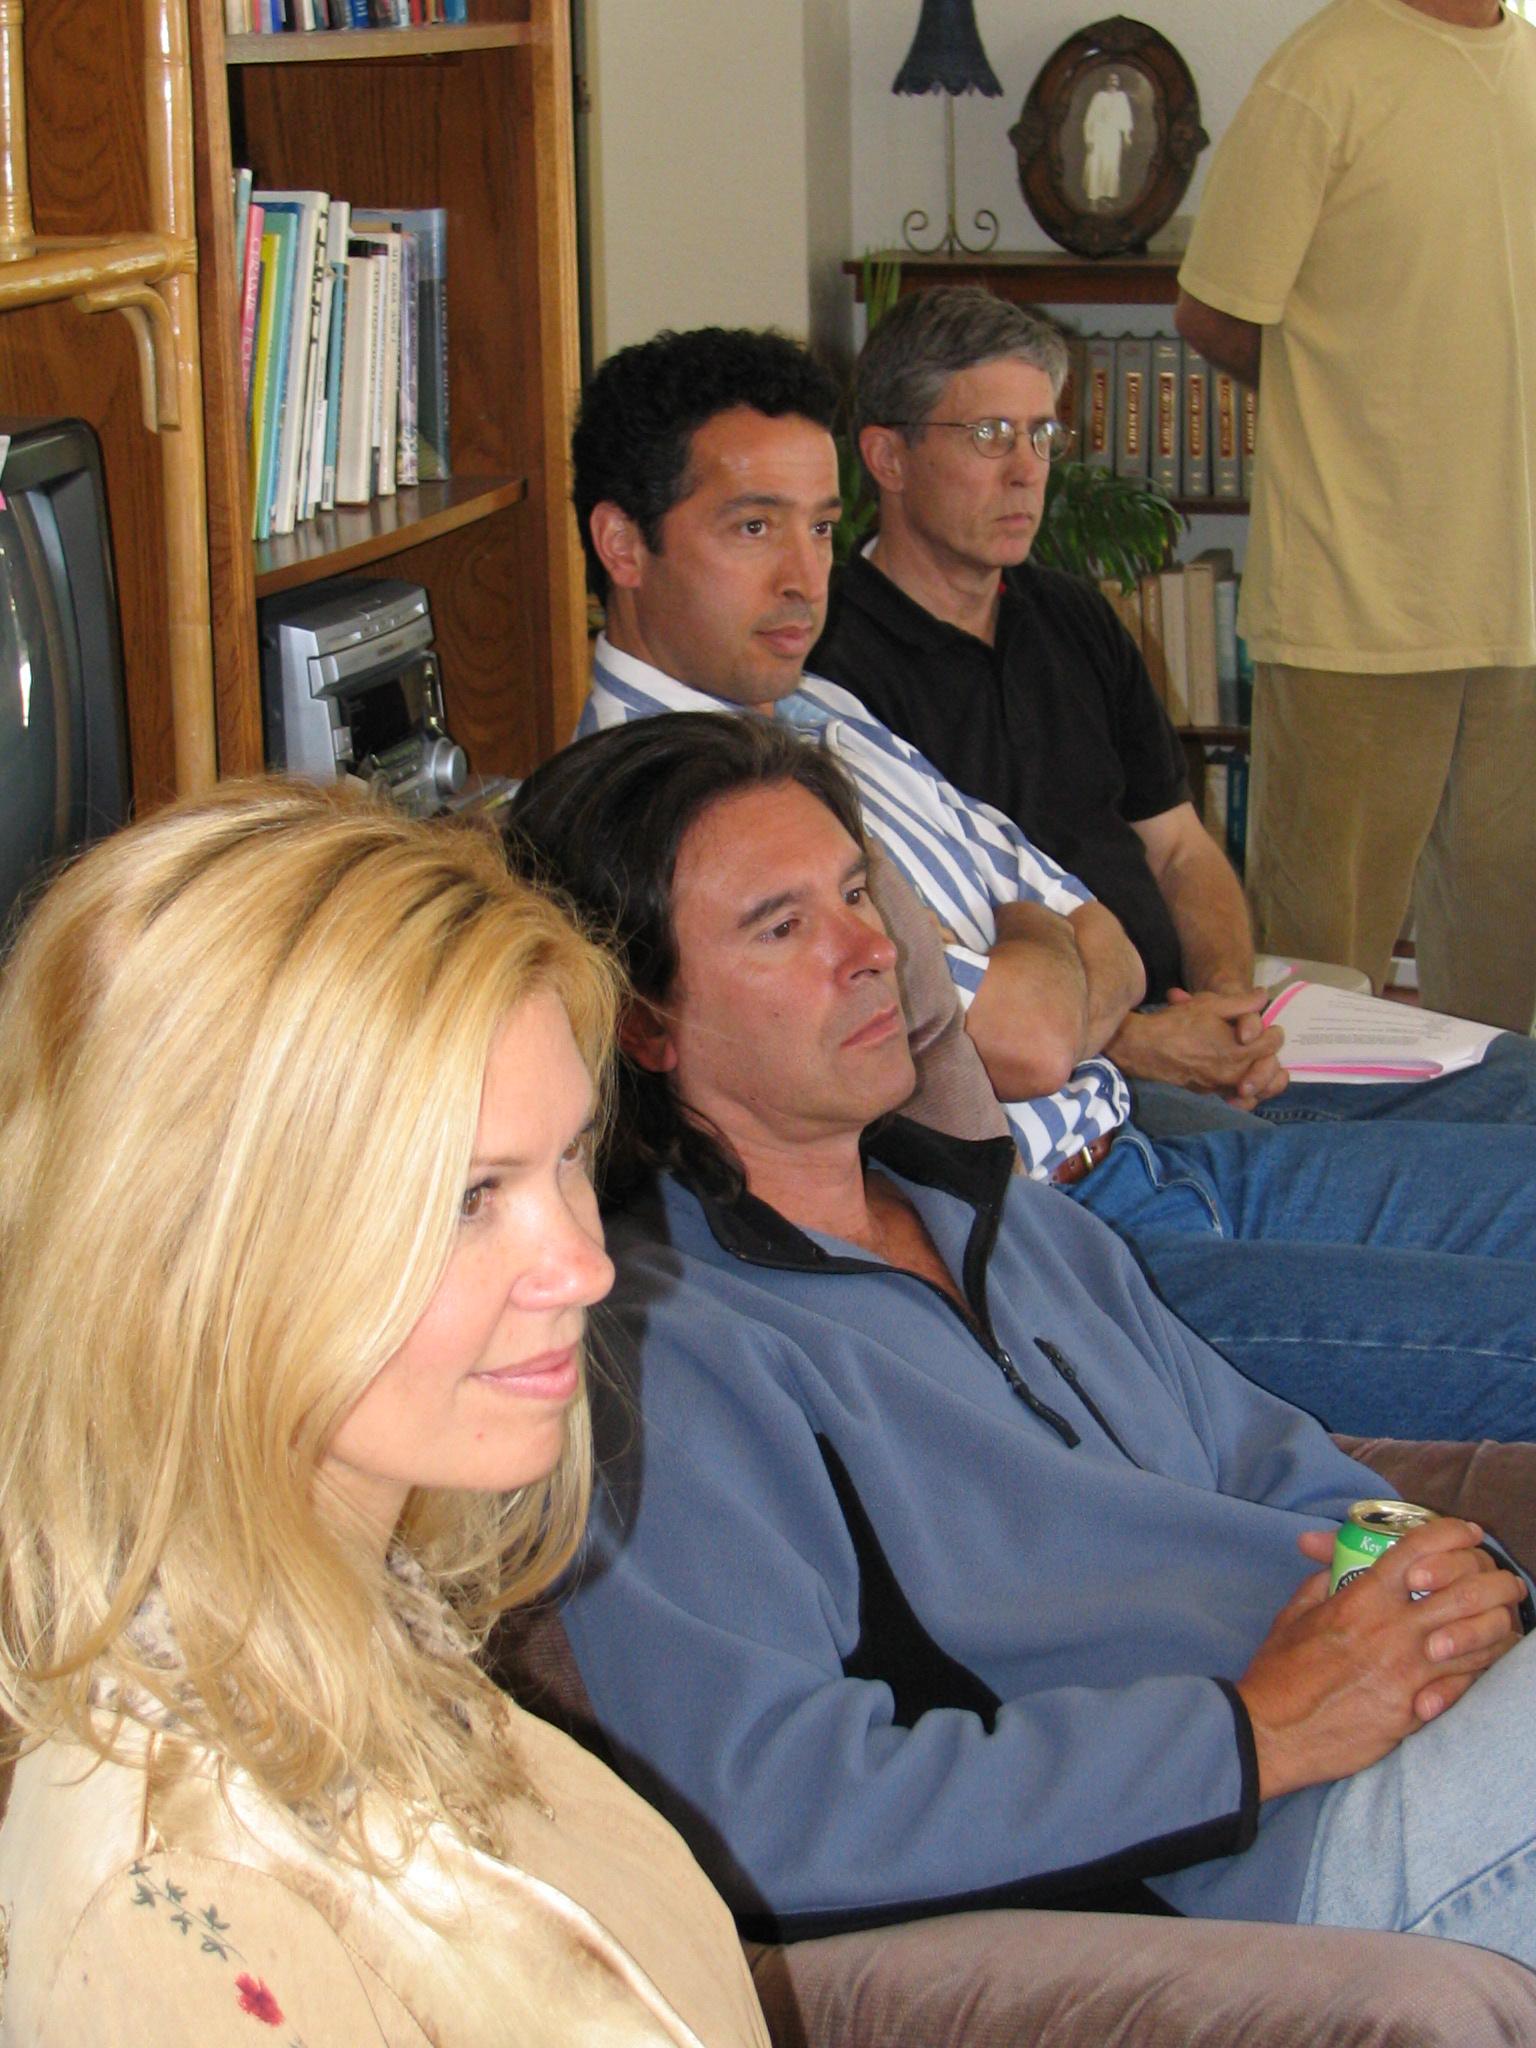 A LONG-RANGE PLANNING DISCUSSION in 2004. (Left to right) Elizabeth Arnold, Manager/Caretaker; Ray Johnston, Manager/Caretaker; Jamshed Ebrahimzadeh, Board Member; and Bing Heckman, Board Member. (Photo: Sam Ervin)